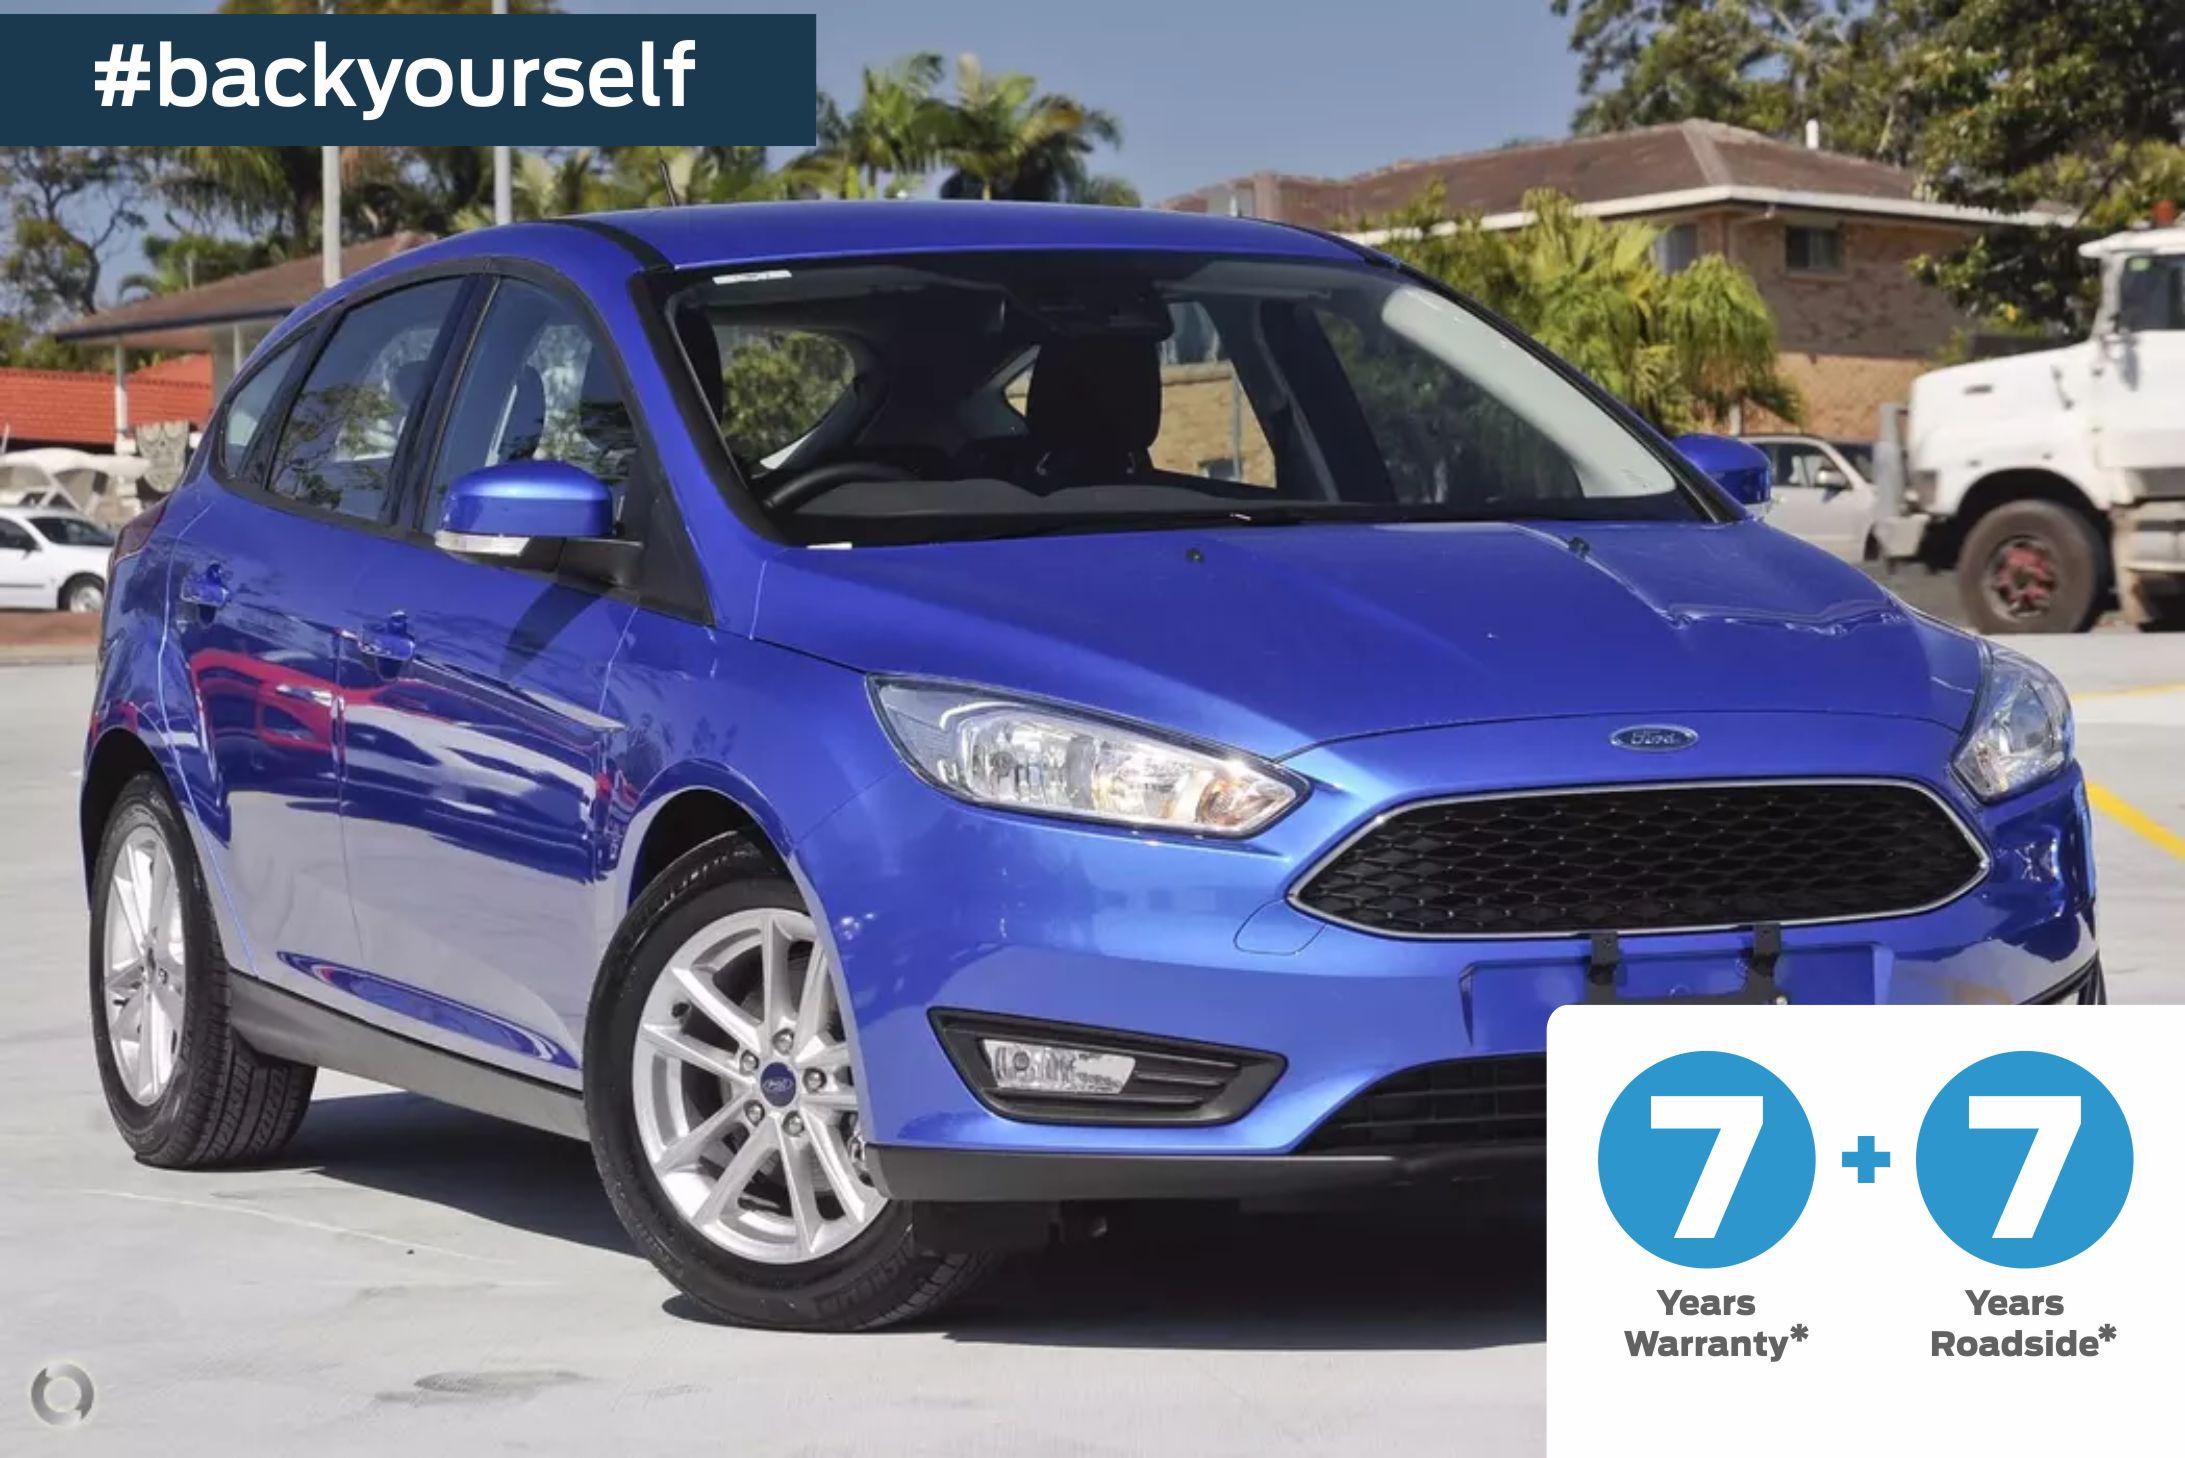 New & Demo Ford Focus 7+7   7 Yrs Warranty + 7 Yrs Roadside*   #itsoktostare!